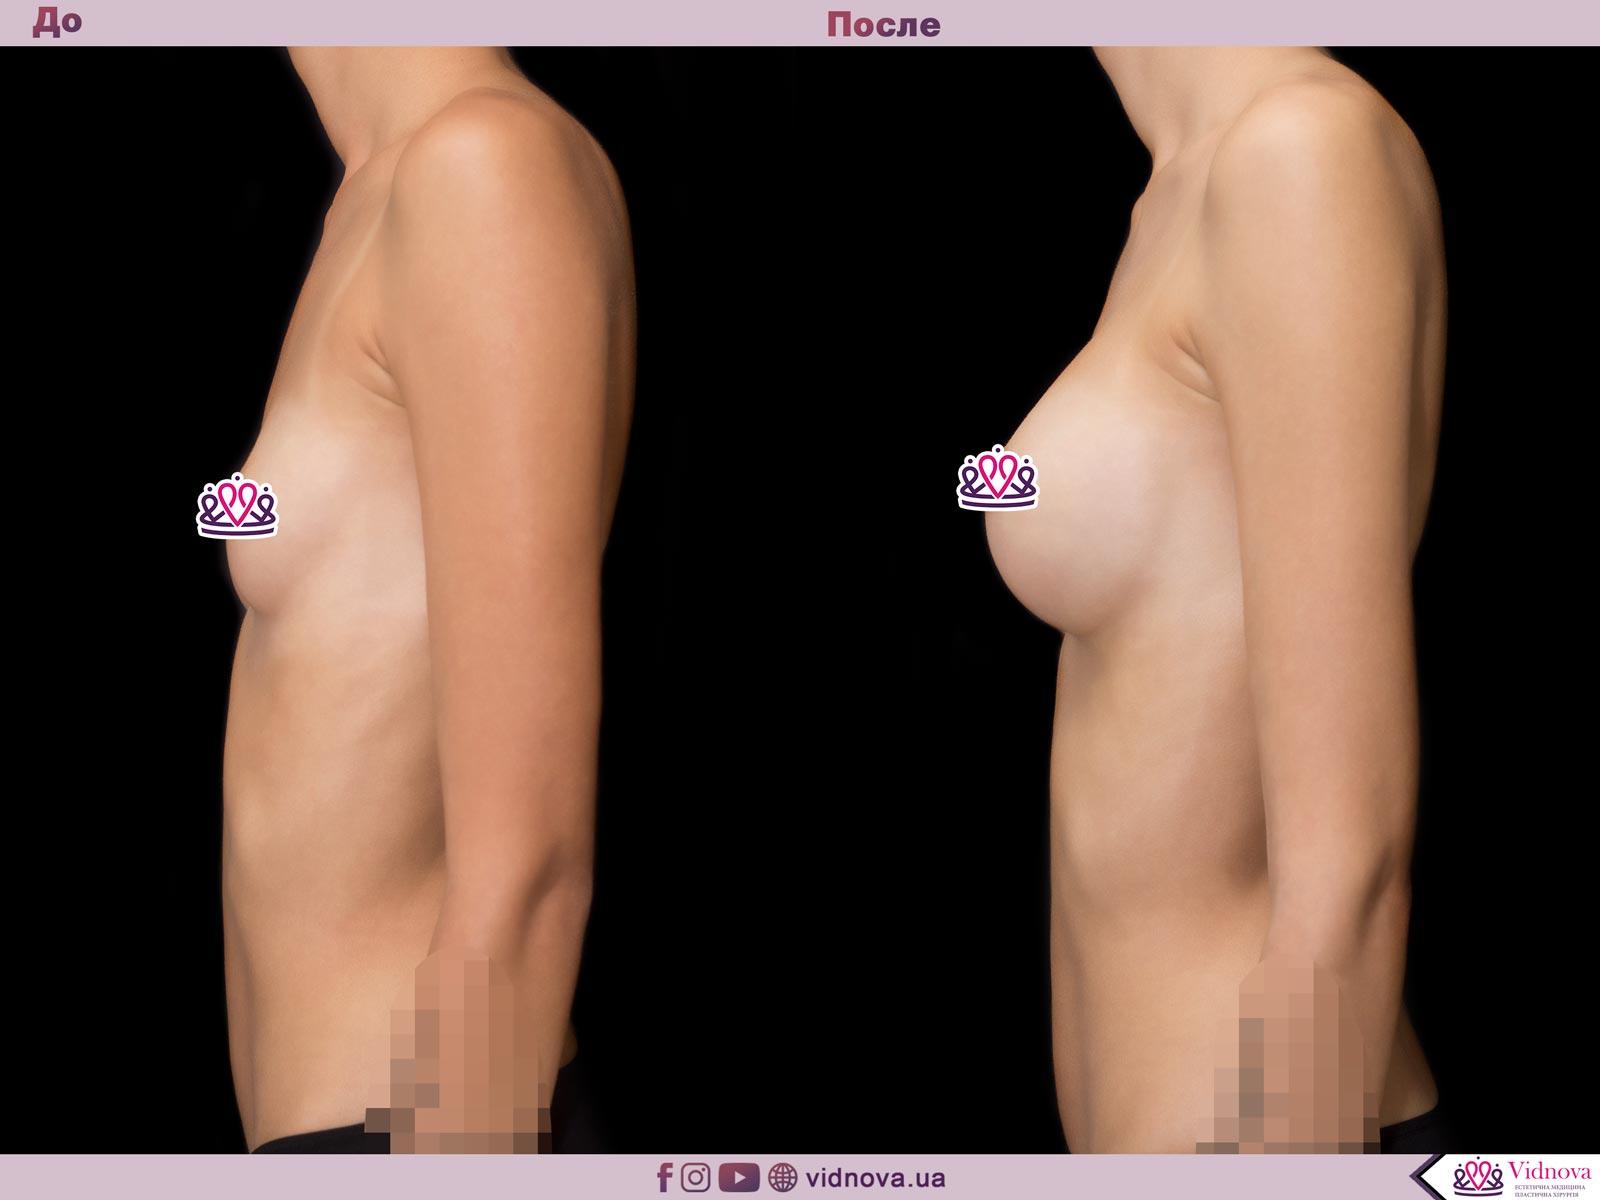 Увеличение груди: Фото ДО и ПОСЛЕ - Пример №44-3 - Клиника Vidnova